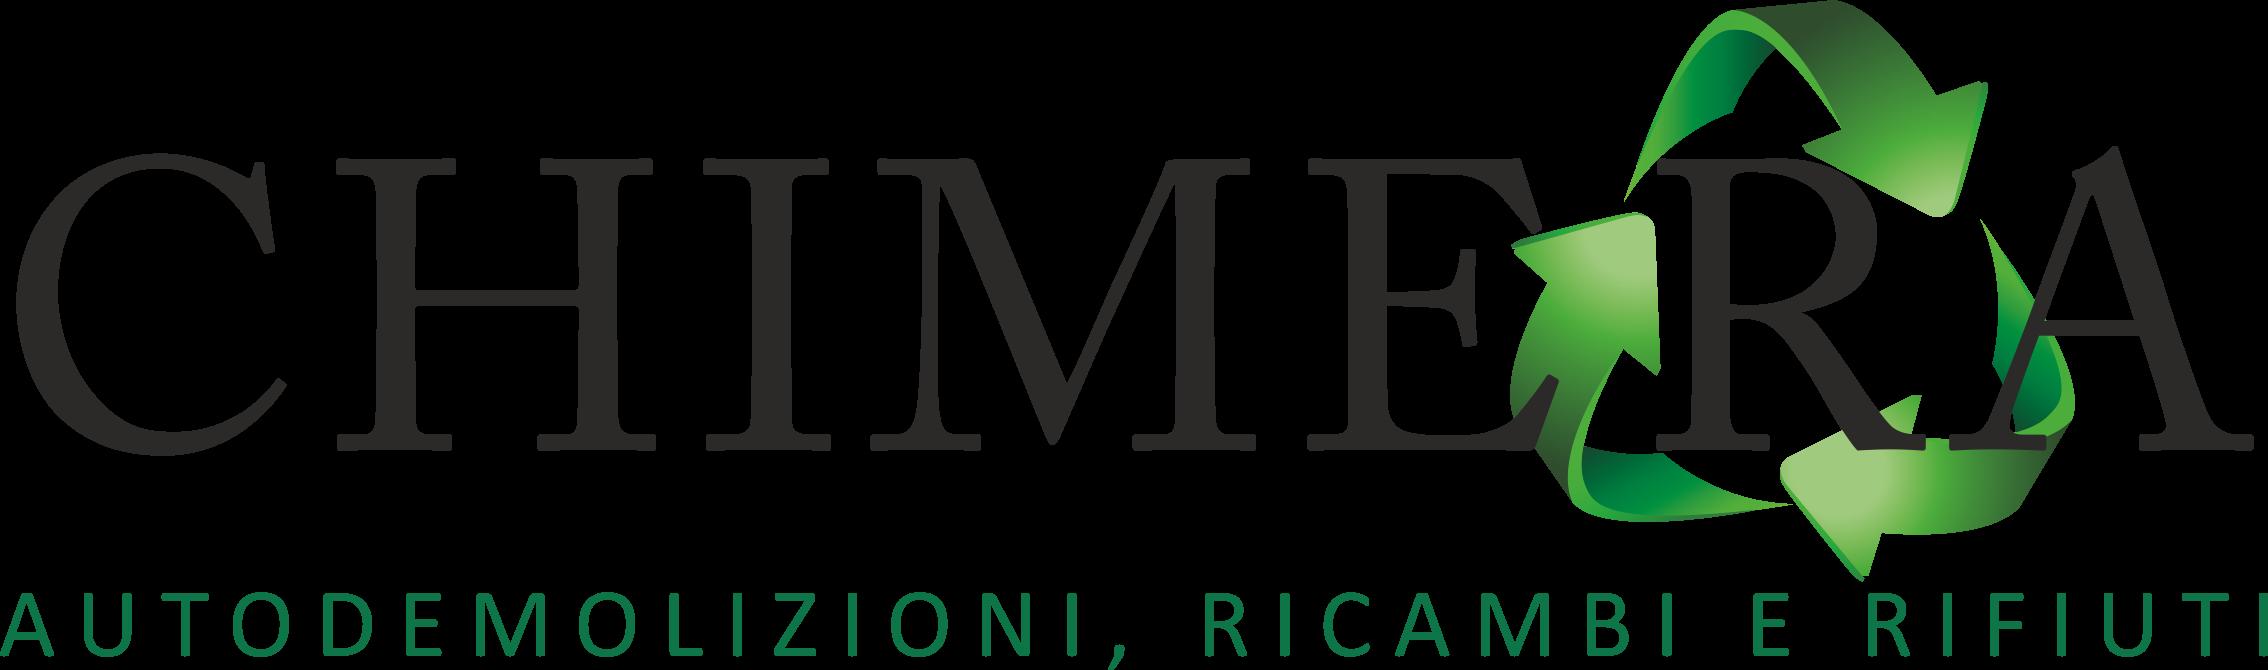 Autodemolizioni Chimera -Ricambi Usati